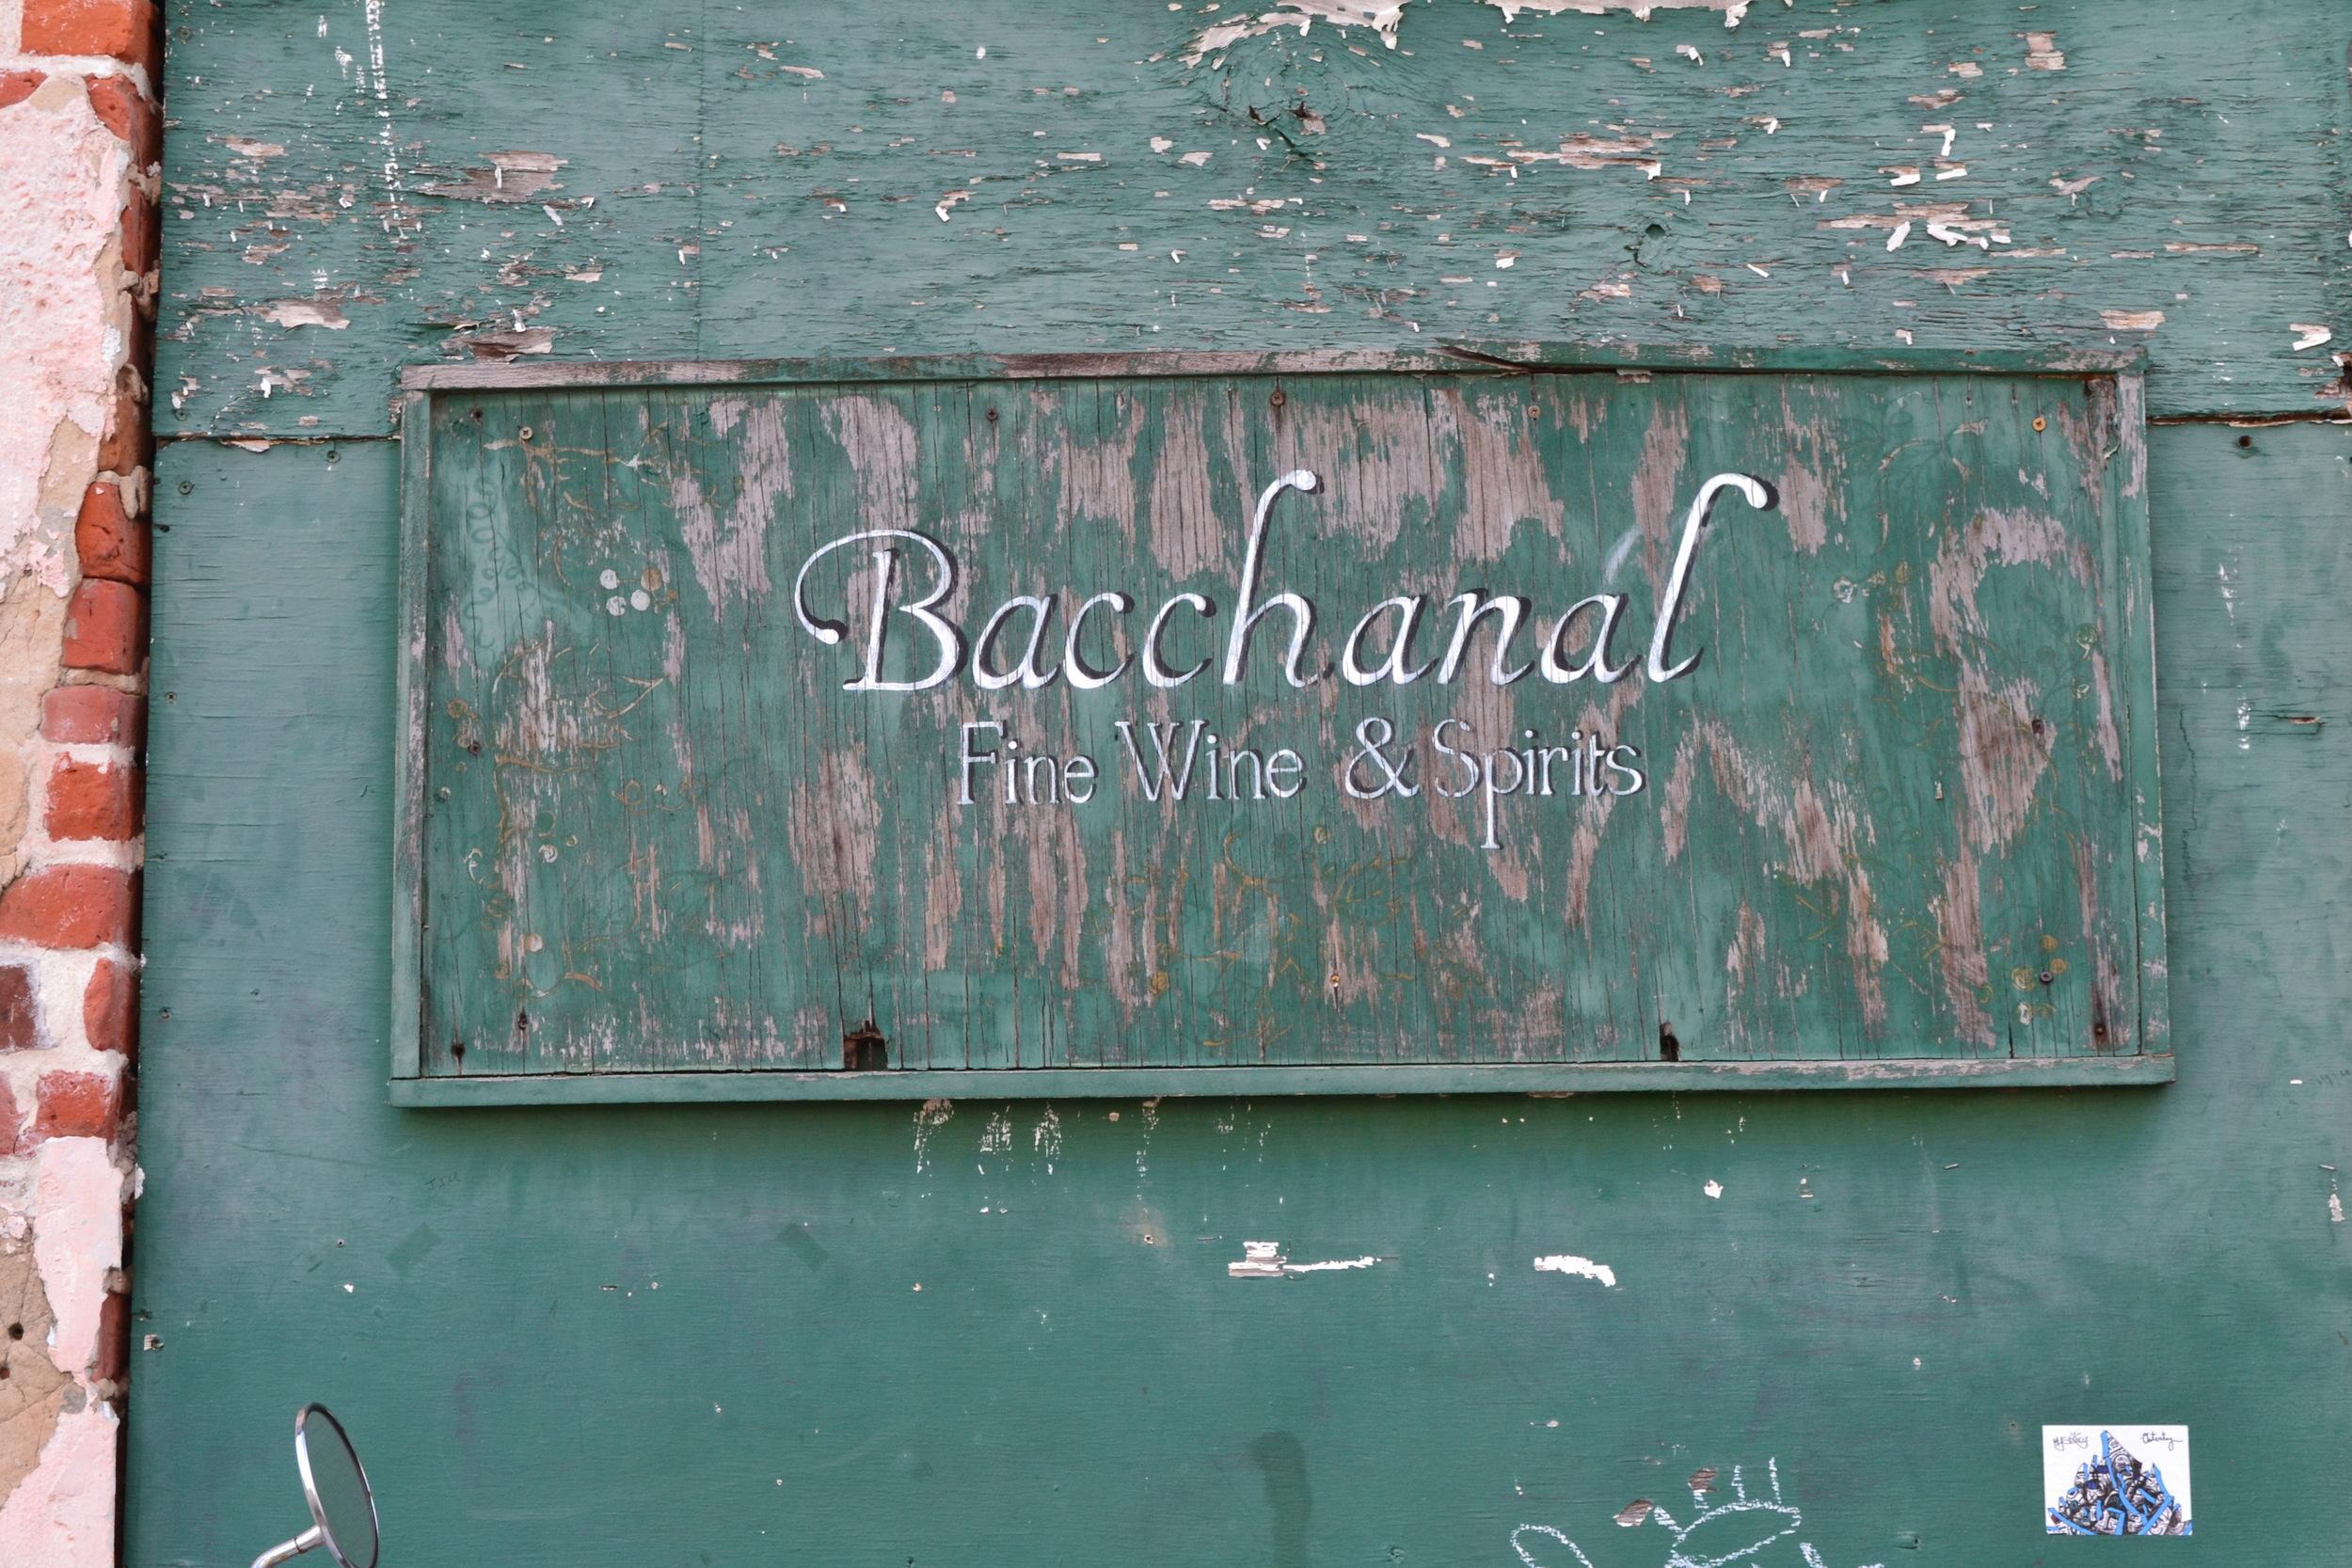 Homey Feel at Bacchanal